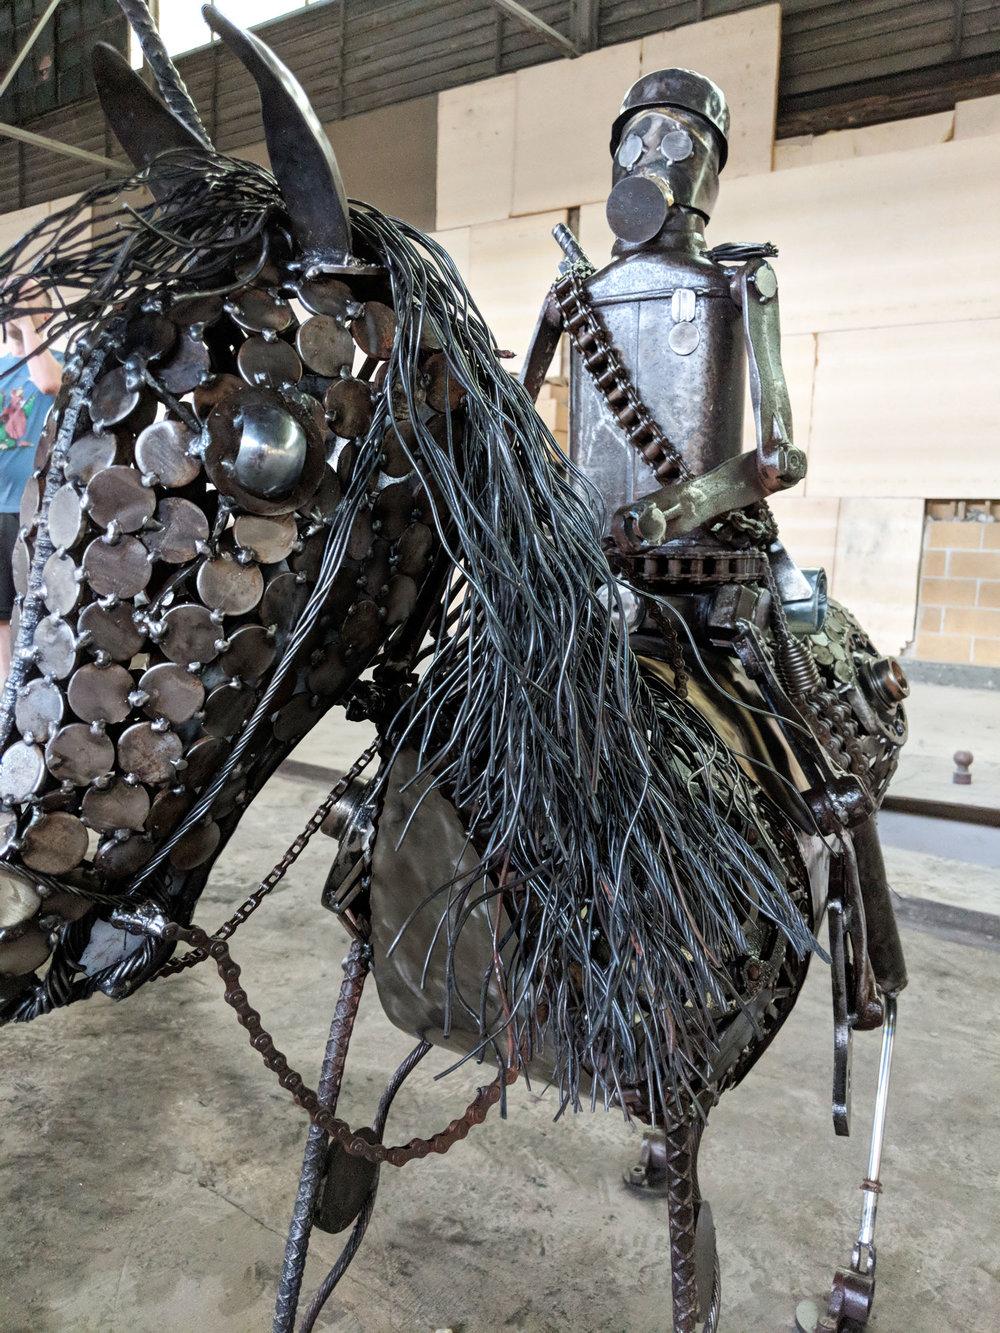 soldier_on_horse6.jpg